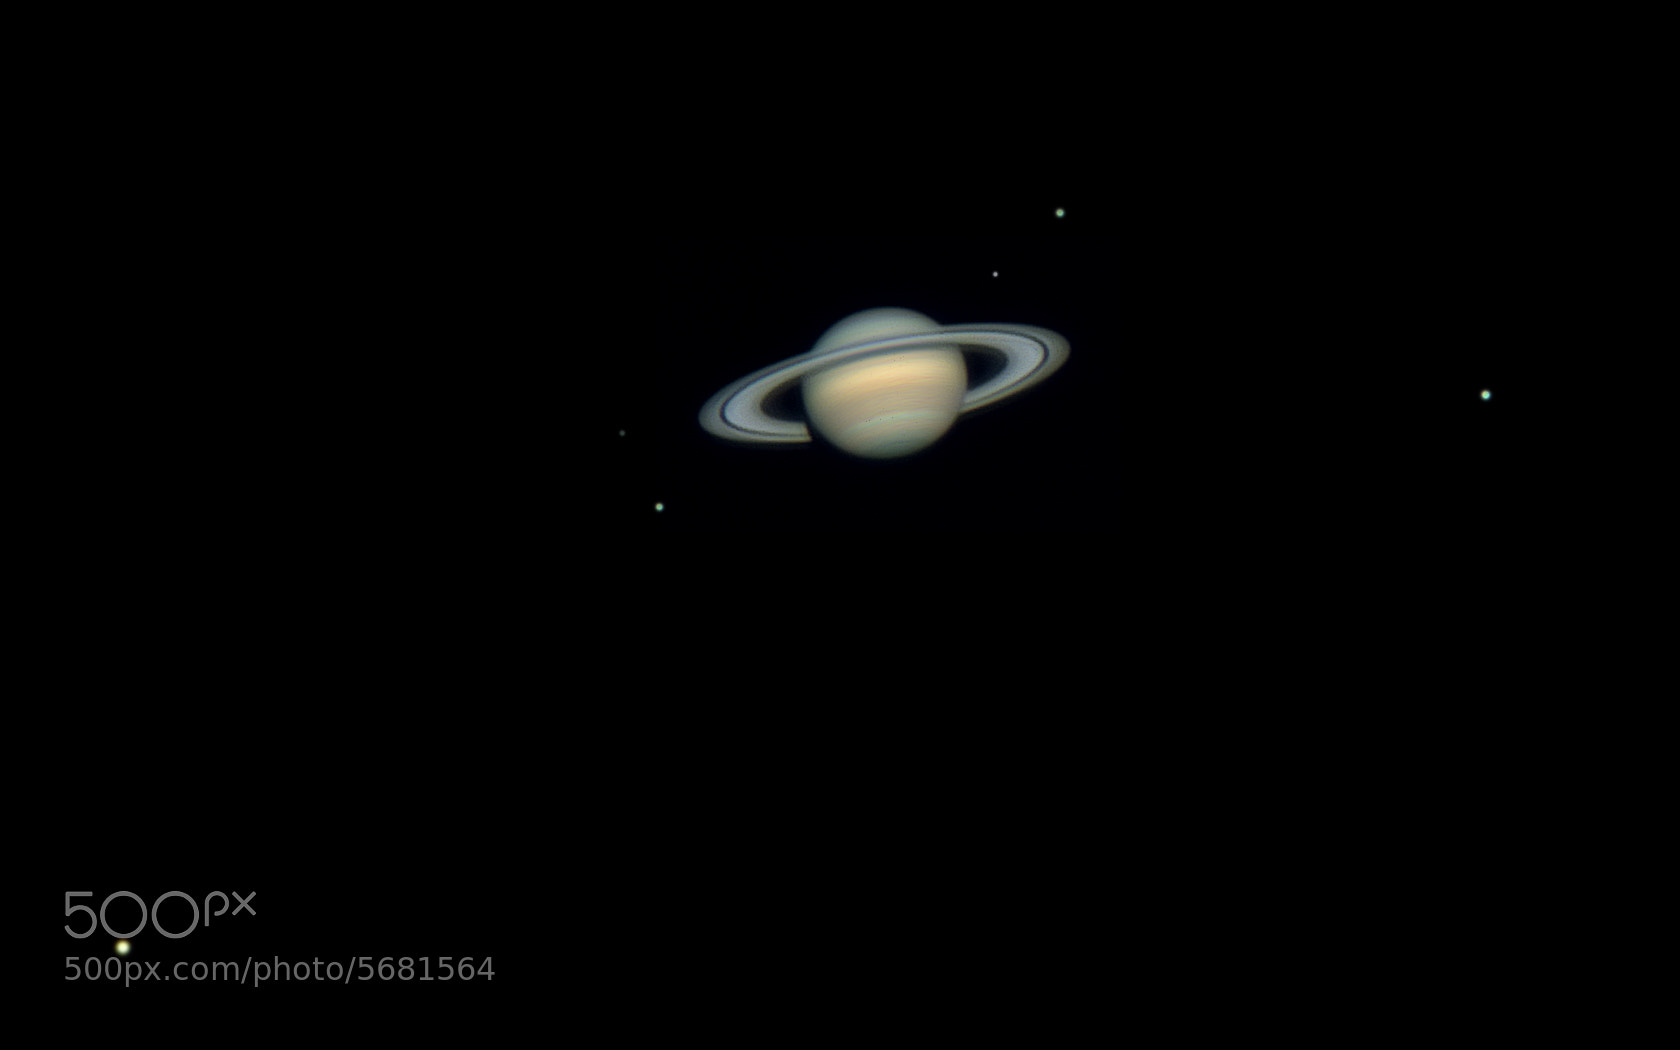 Photograph Six Saturn Moons by Rafael Defavari on 500px